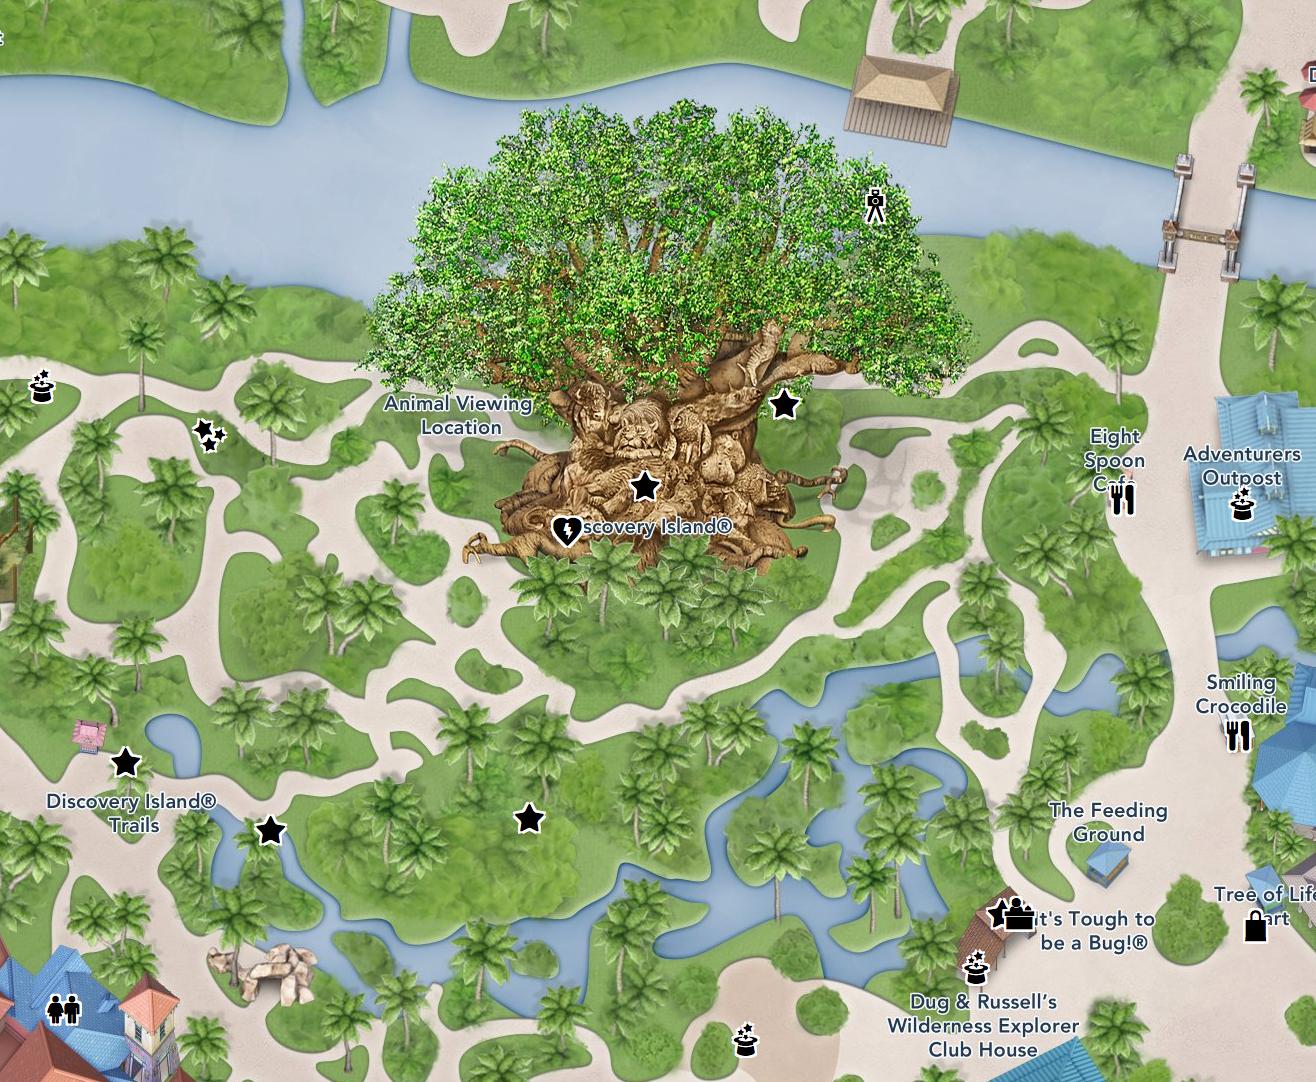 The Tree of Life at Magic Kingdom.